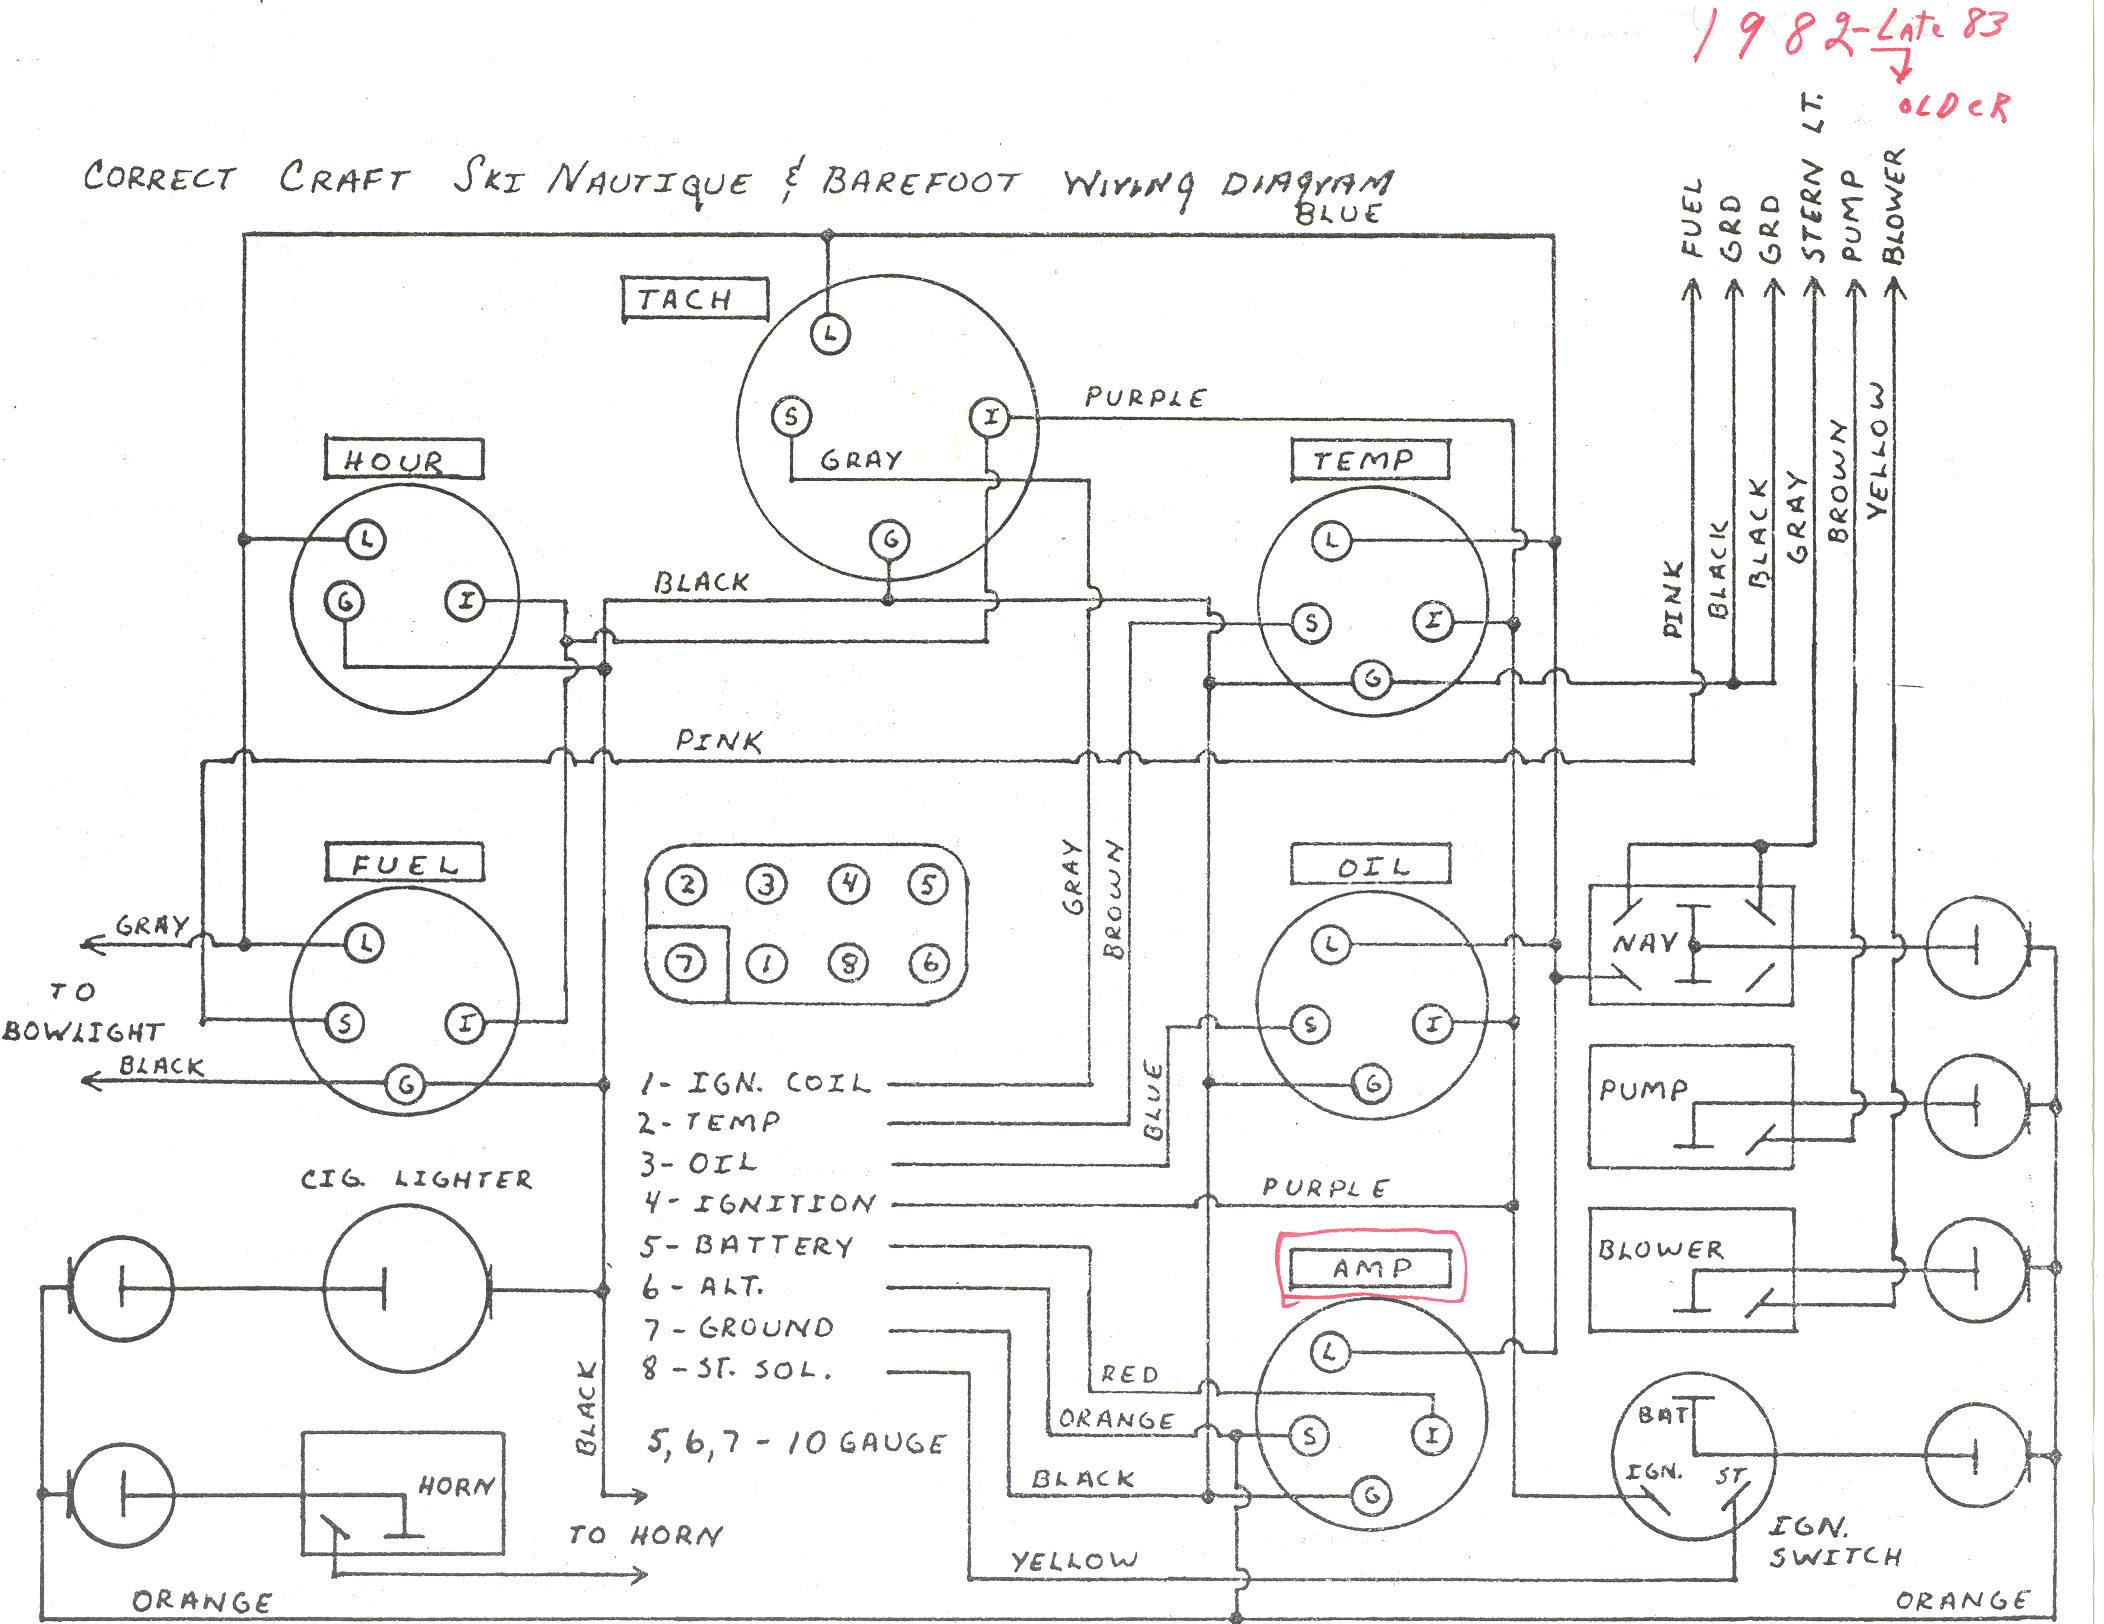 1980 Ranger Bass Boat Wiring Diagram 2008 Mercedes C350 Fuse Box For Wiring Diagram Schematics